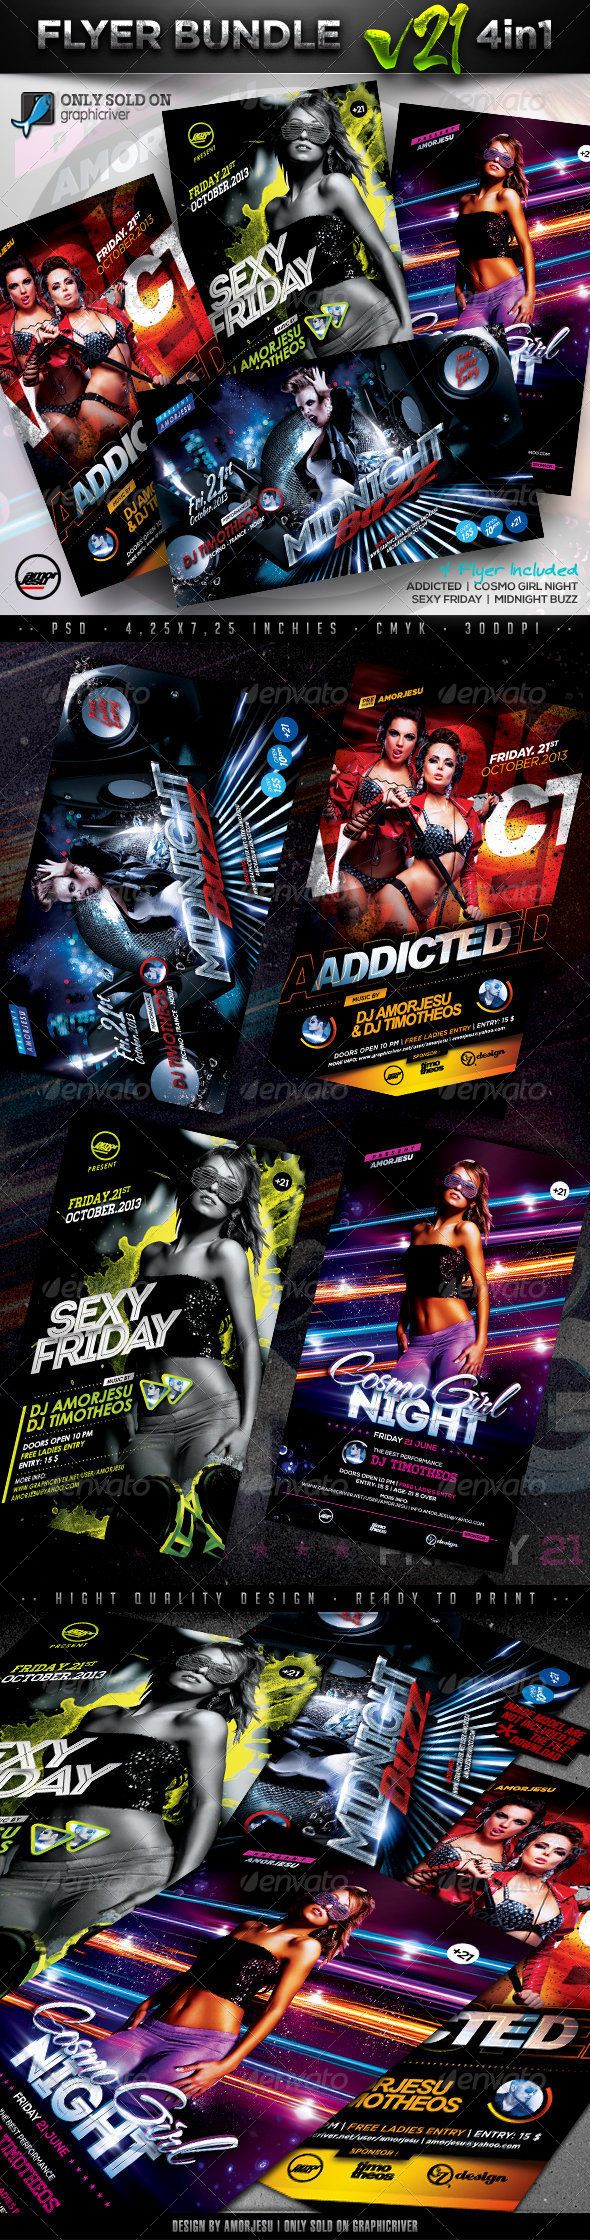 Flyer Bundle Vol21 - 4 in 1 - Clubs & Parties Events